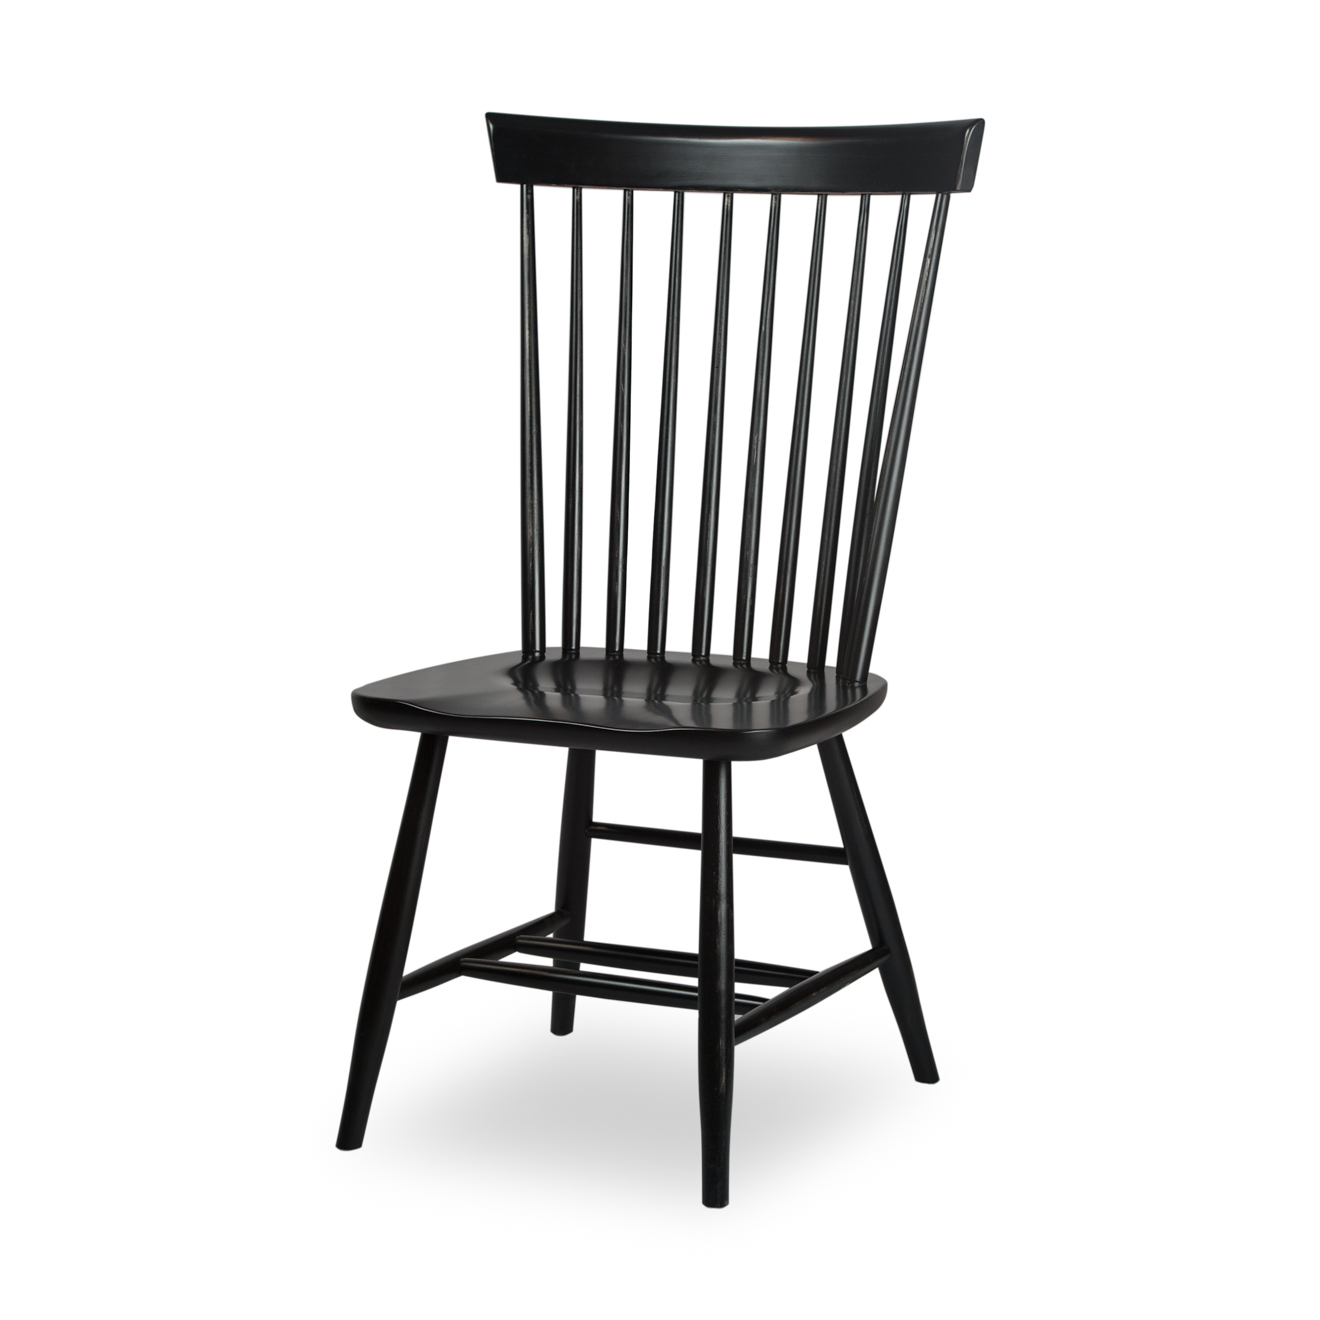 003_Woodcraft_Furniture_WindsorBentArrow_FrtQtr-3.jpg